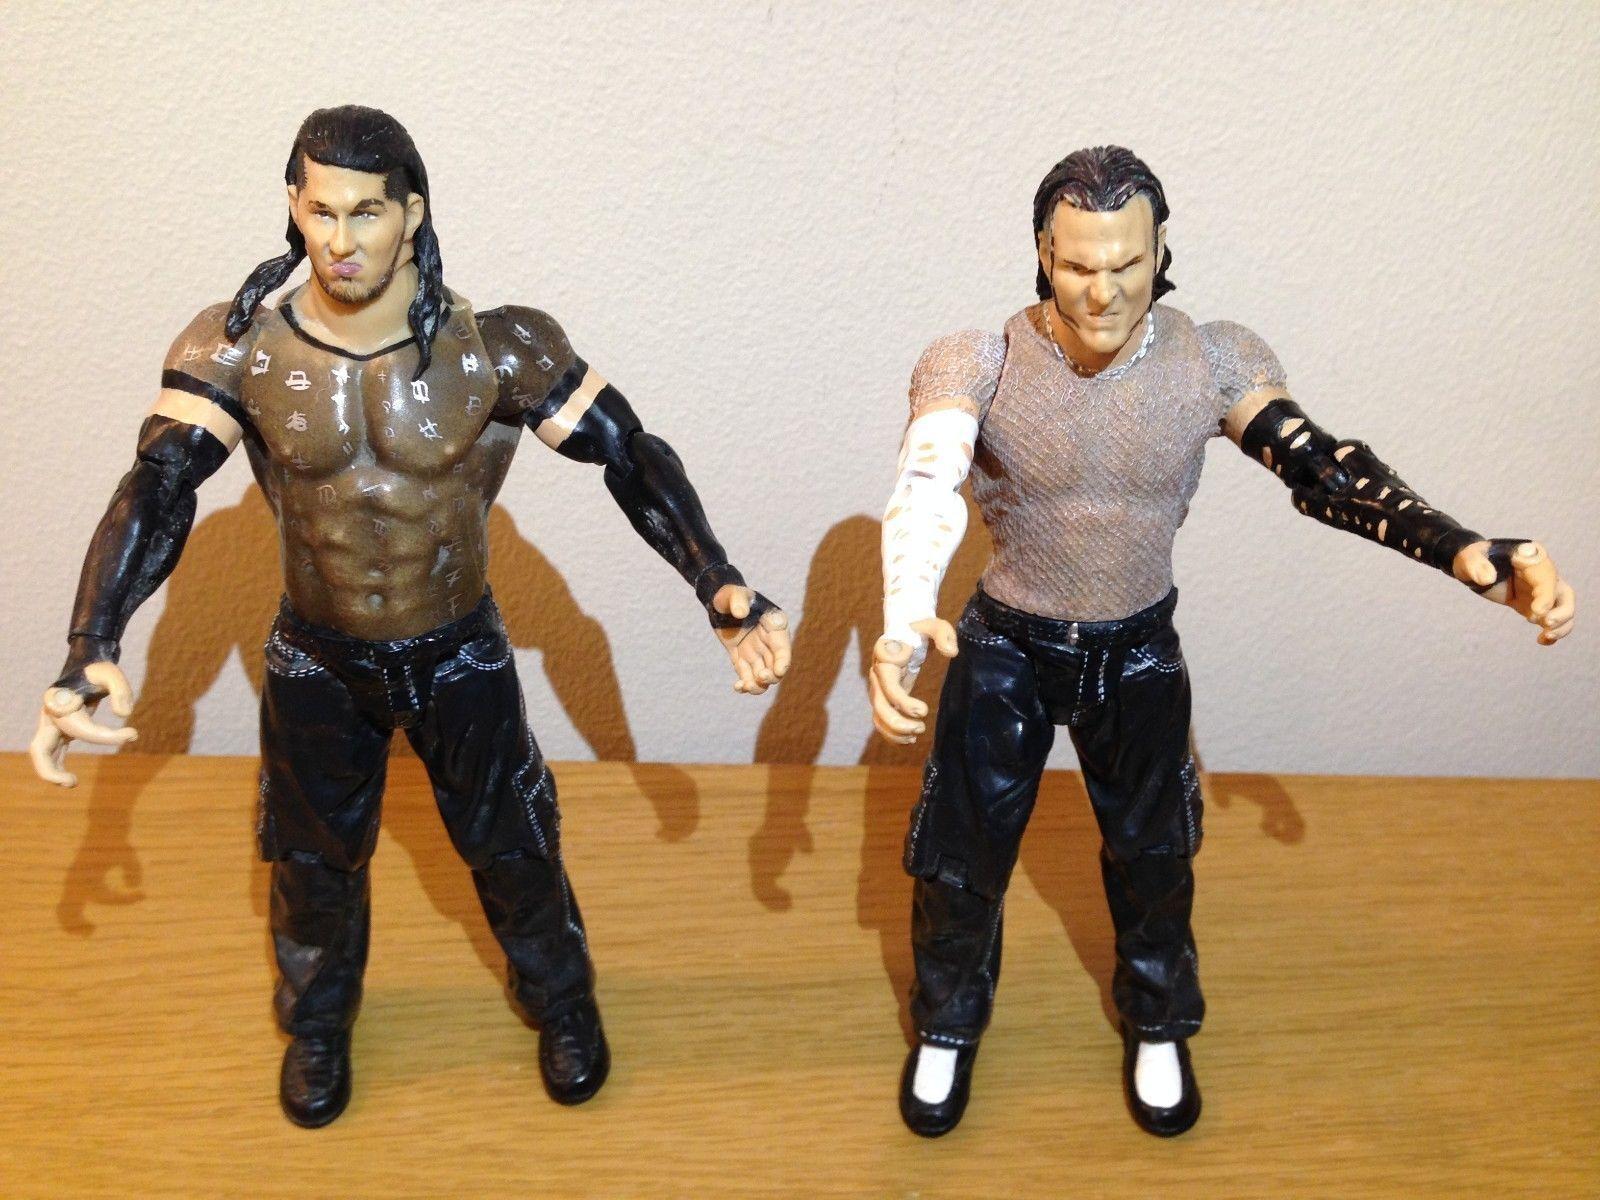 RARE WWF WWE Hardy Boyz Jeff Hardy and Matt Hardy Wrestling figures, loads more